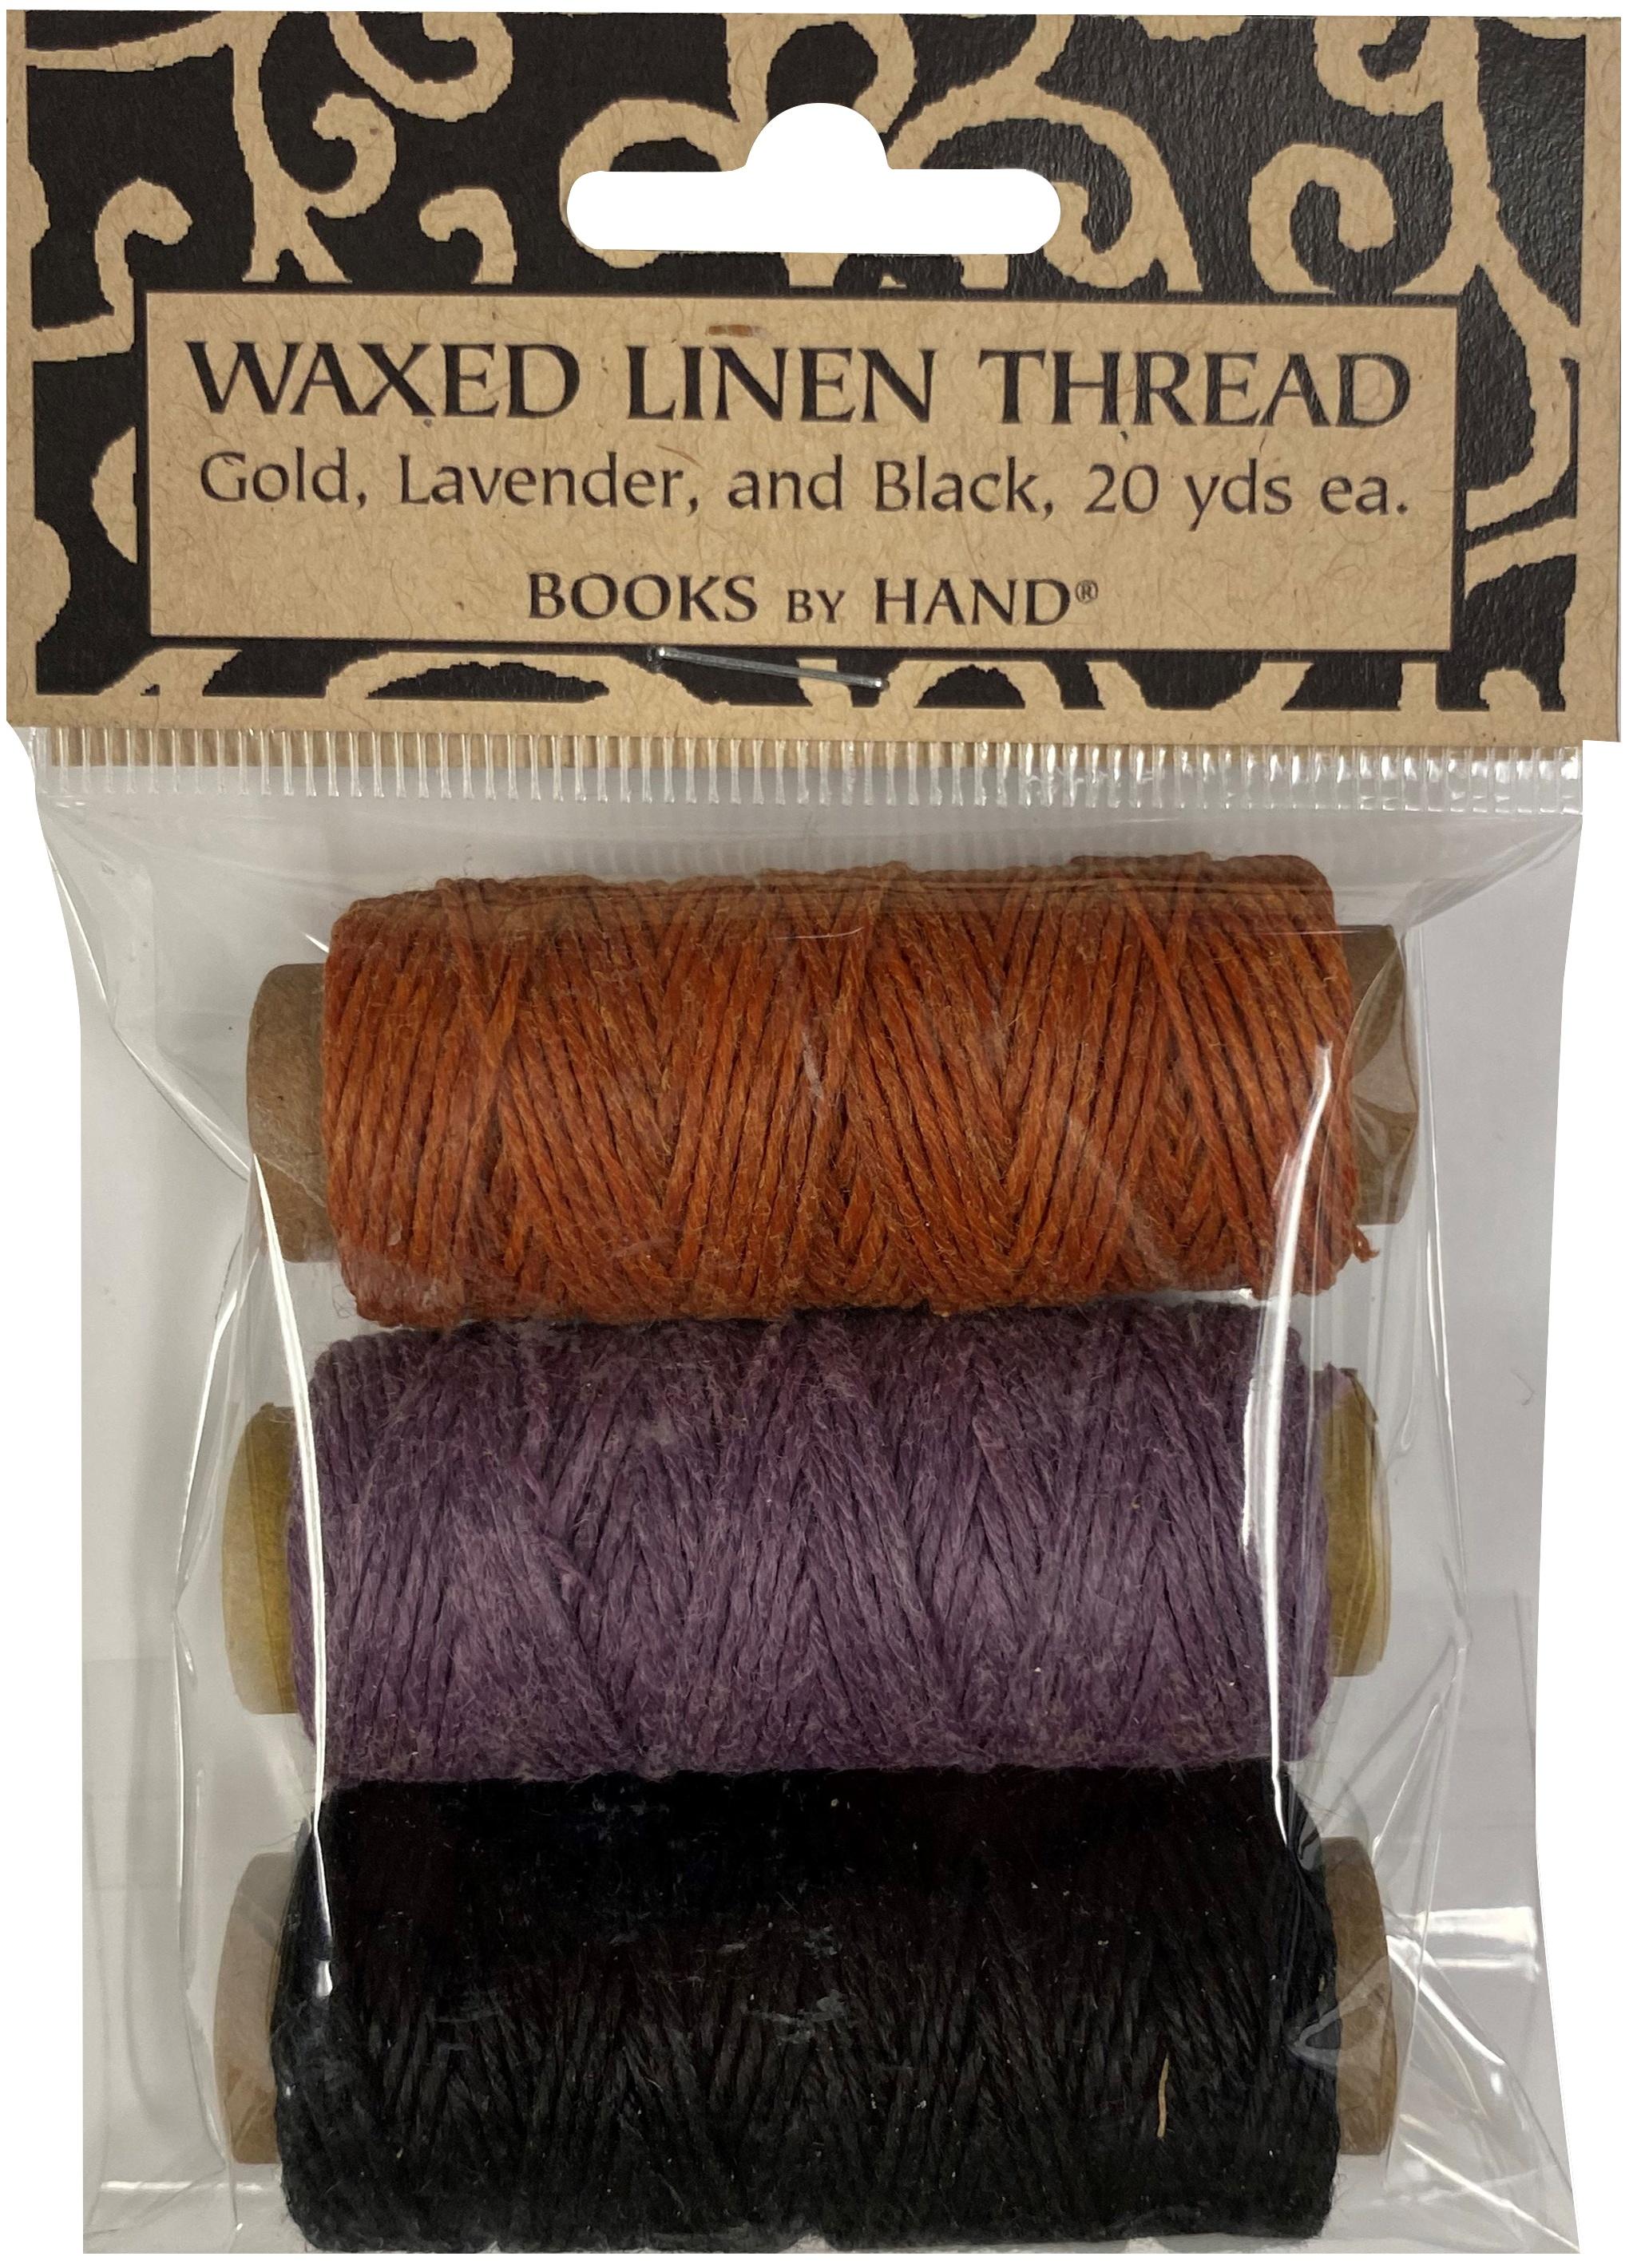 Lineco Waxed Linen 5 Ply Thread 3/Pkg-Lavender, Orange-Gold, Black; 20yd Each